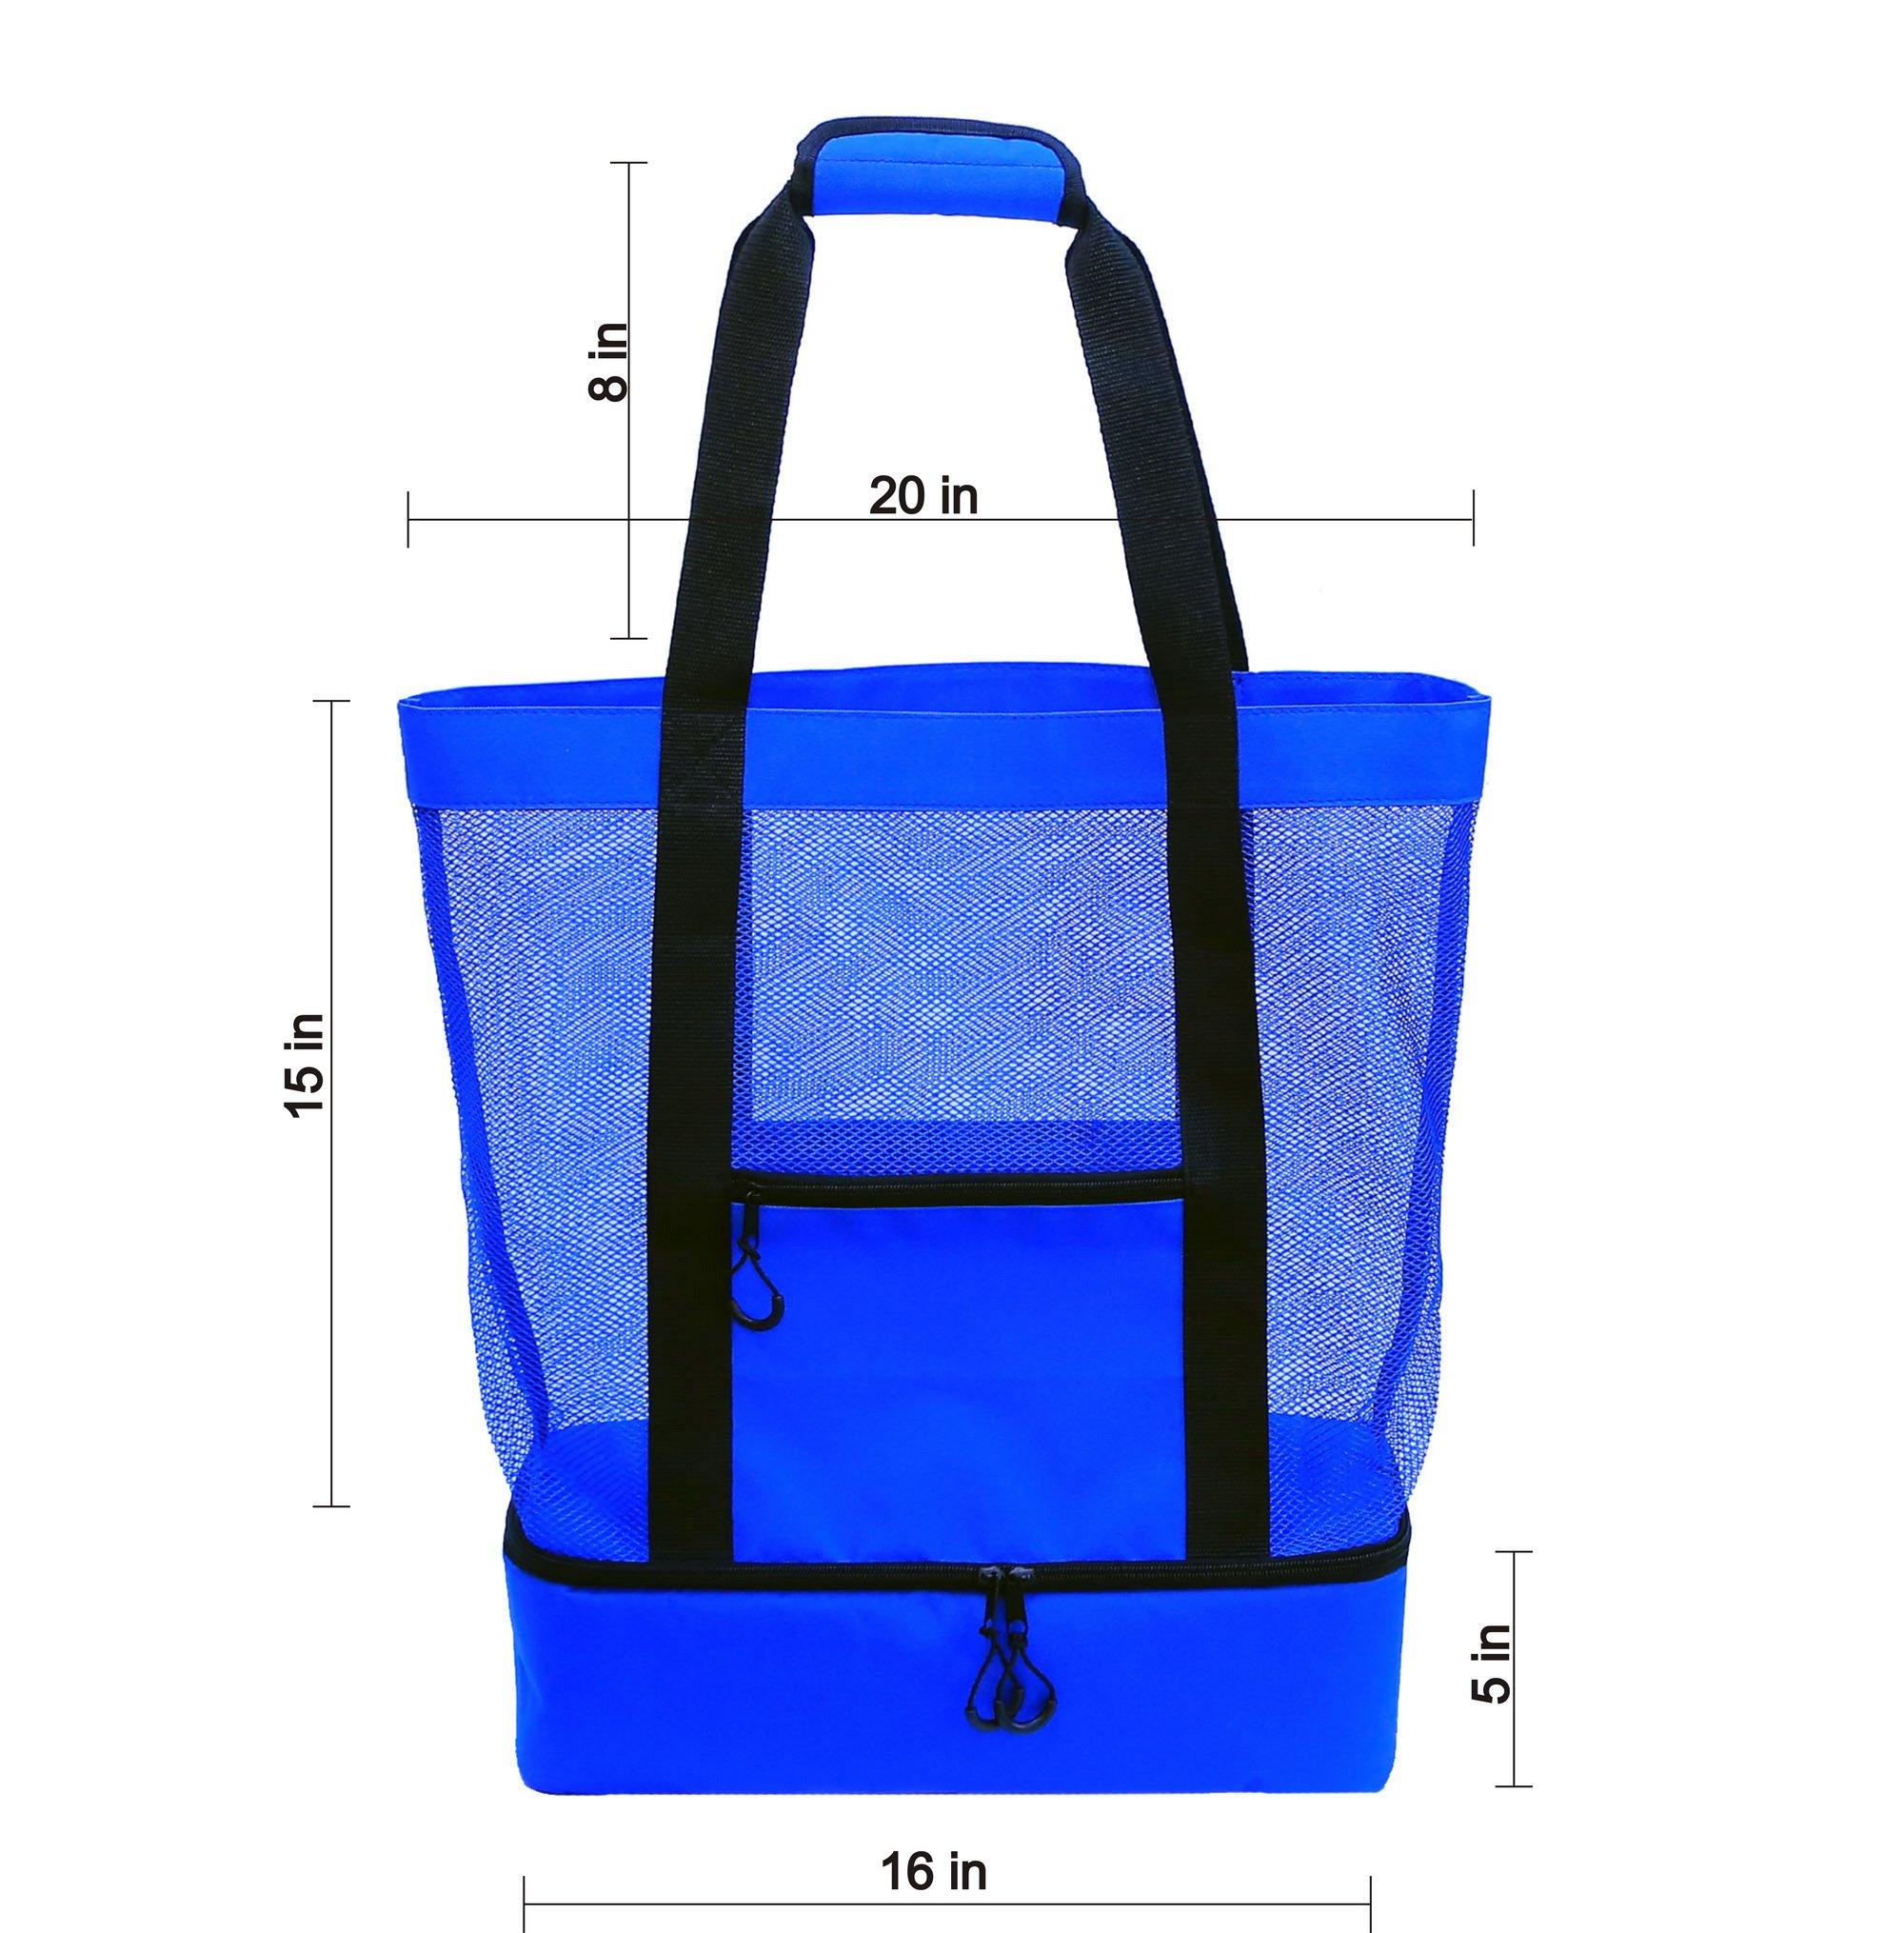 JU&JI's Beach Tote Bags – 2-in-1 Design – Mesh Bag & Built-in Picnic Cooler Compartment – Big or Extra Large Cooler Beach Bags – Padded Handle, Waterproof Zipper & Heavy-Duty Build by Ju&Ji (Image #2)